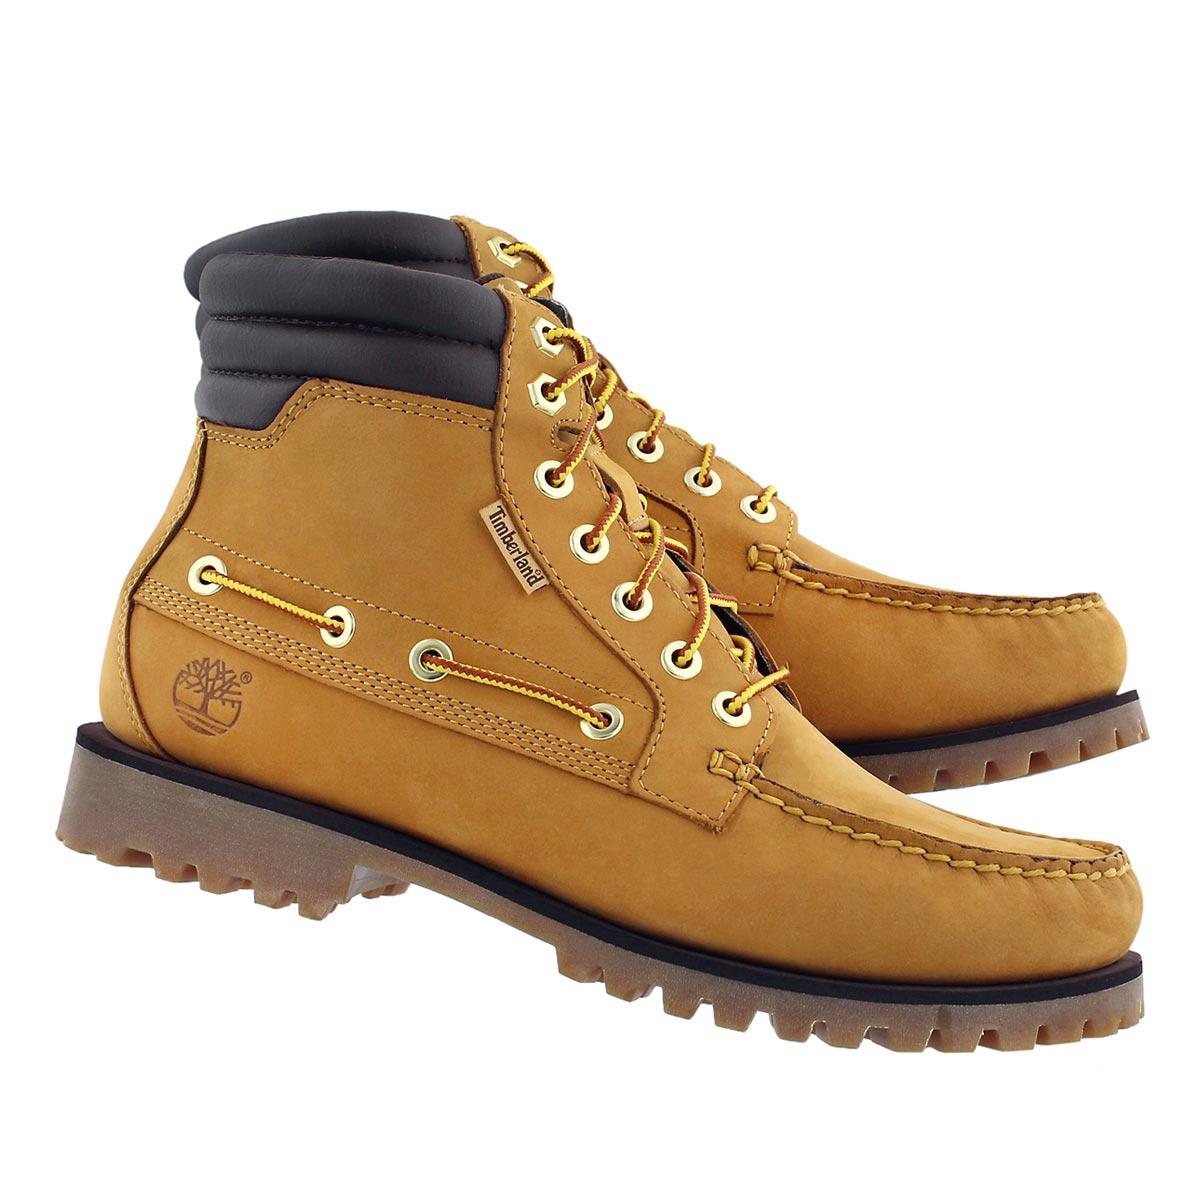 Mns Oakwell 7 eye wheat ankle boot